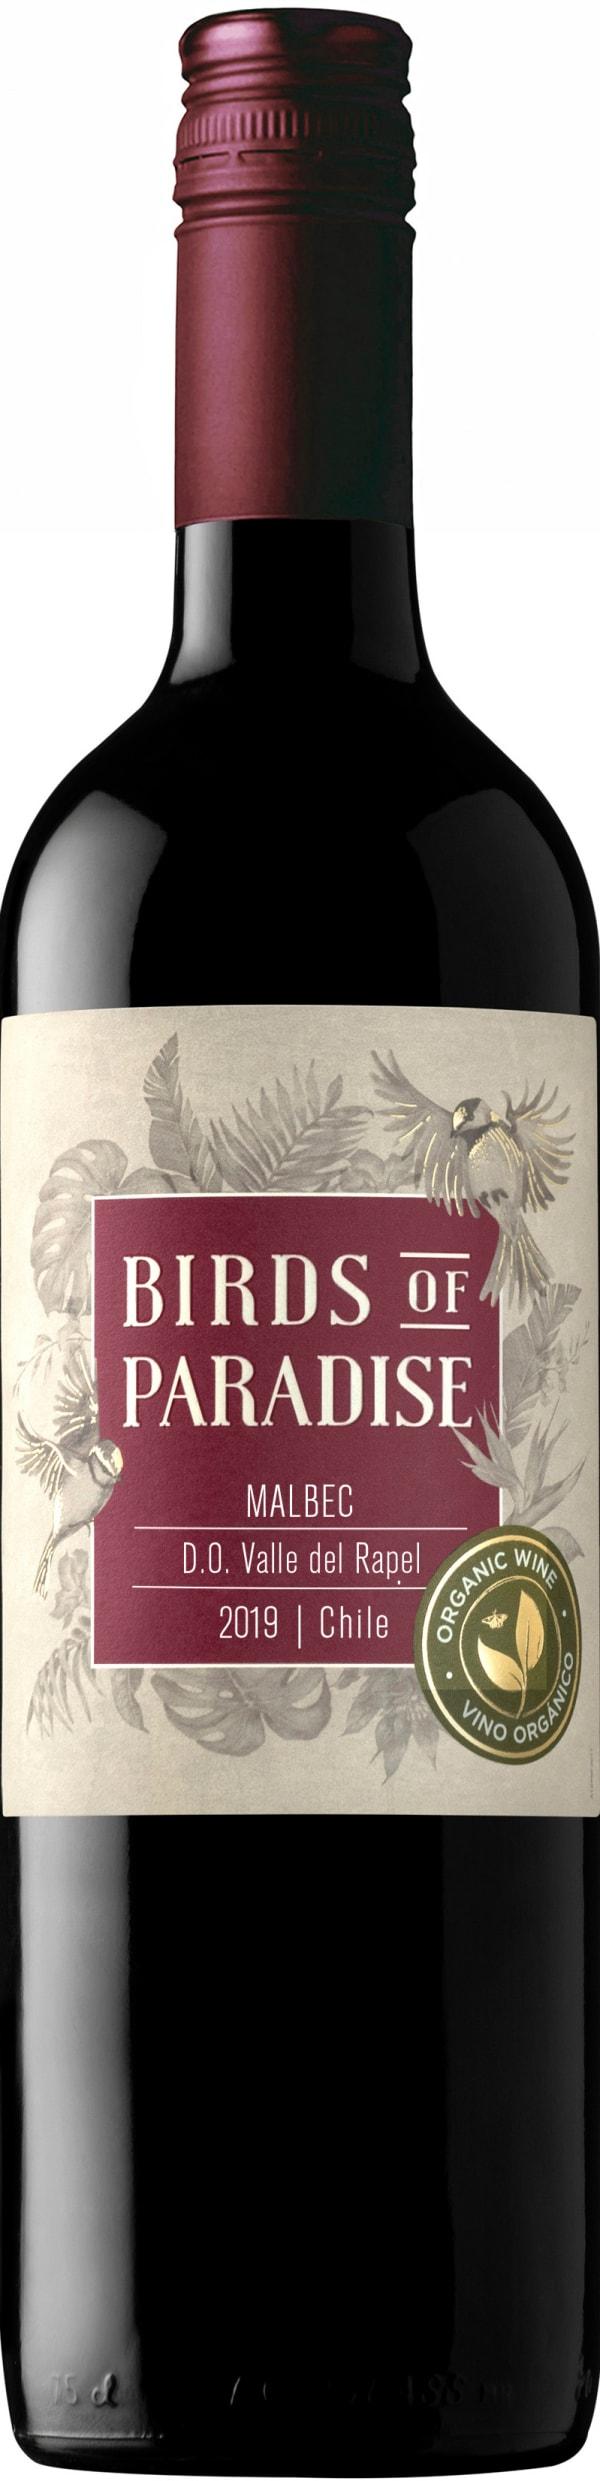 Birds of Paradise Malbec 2019